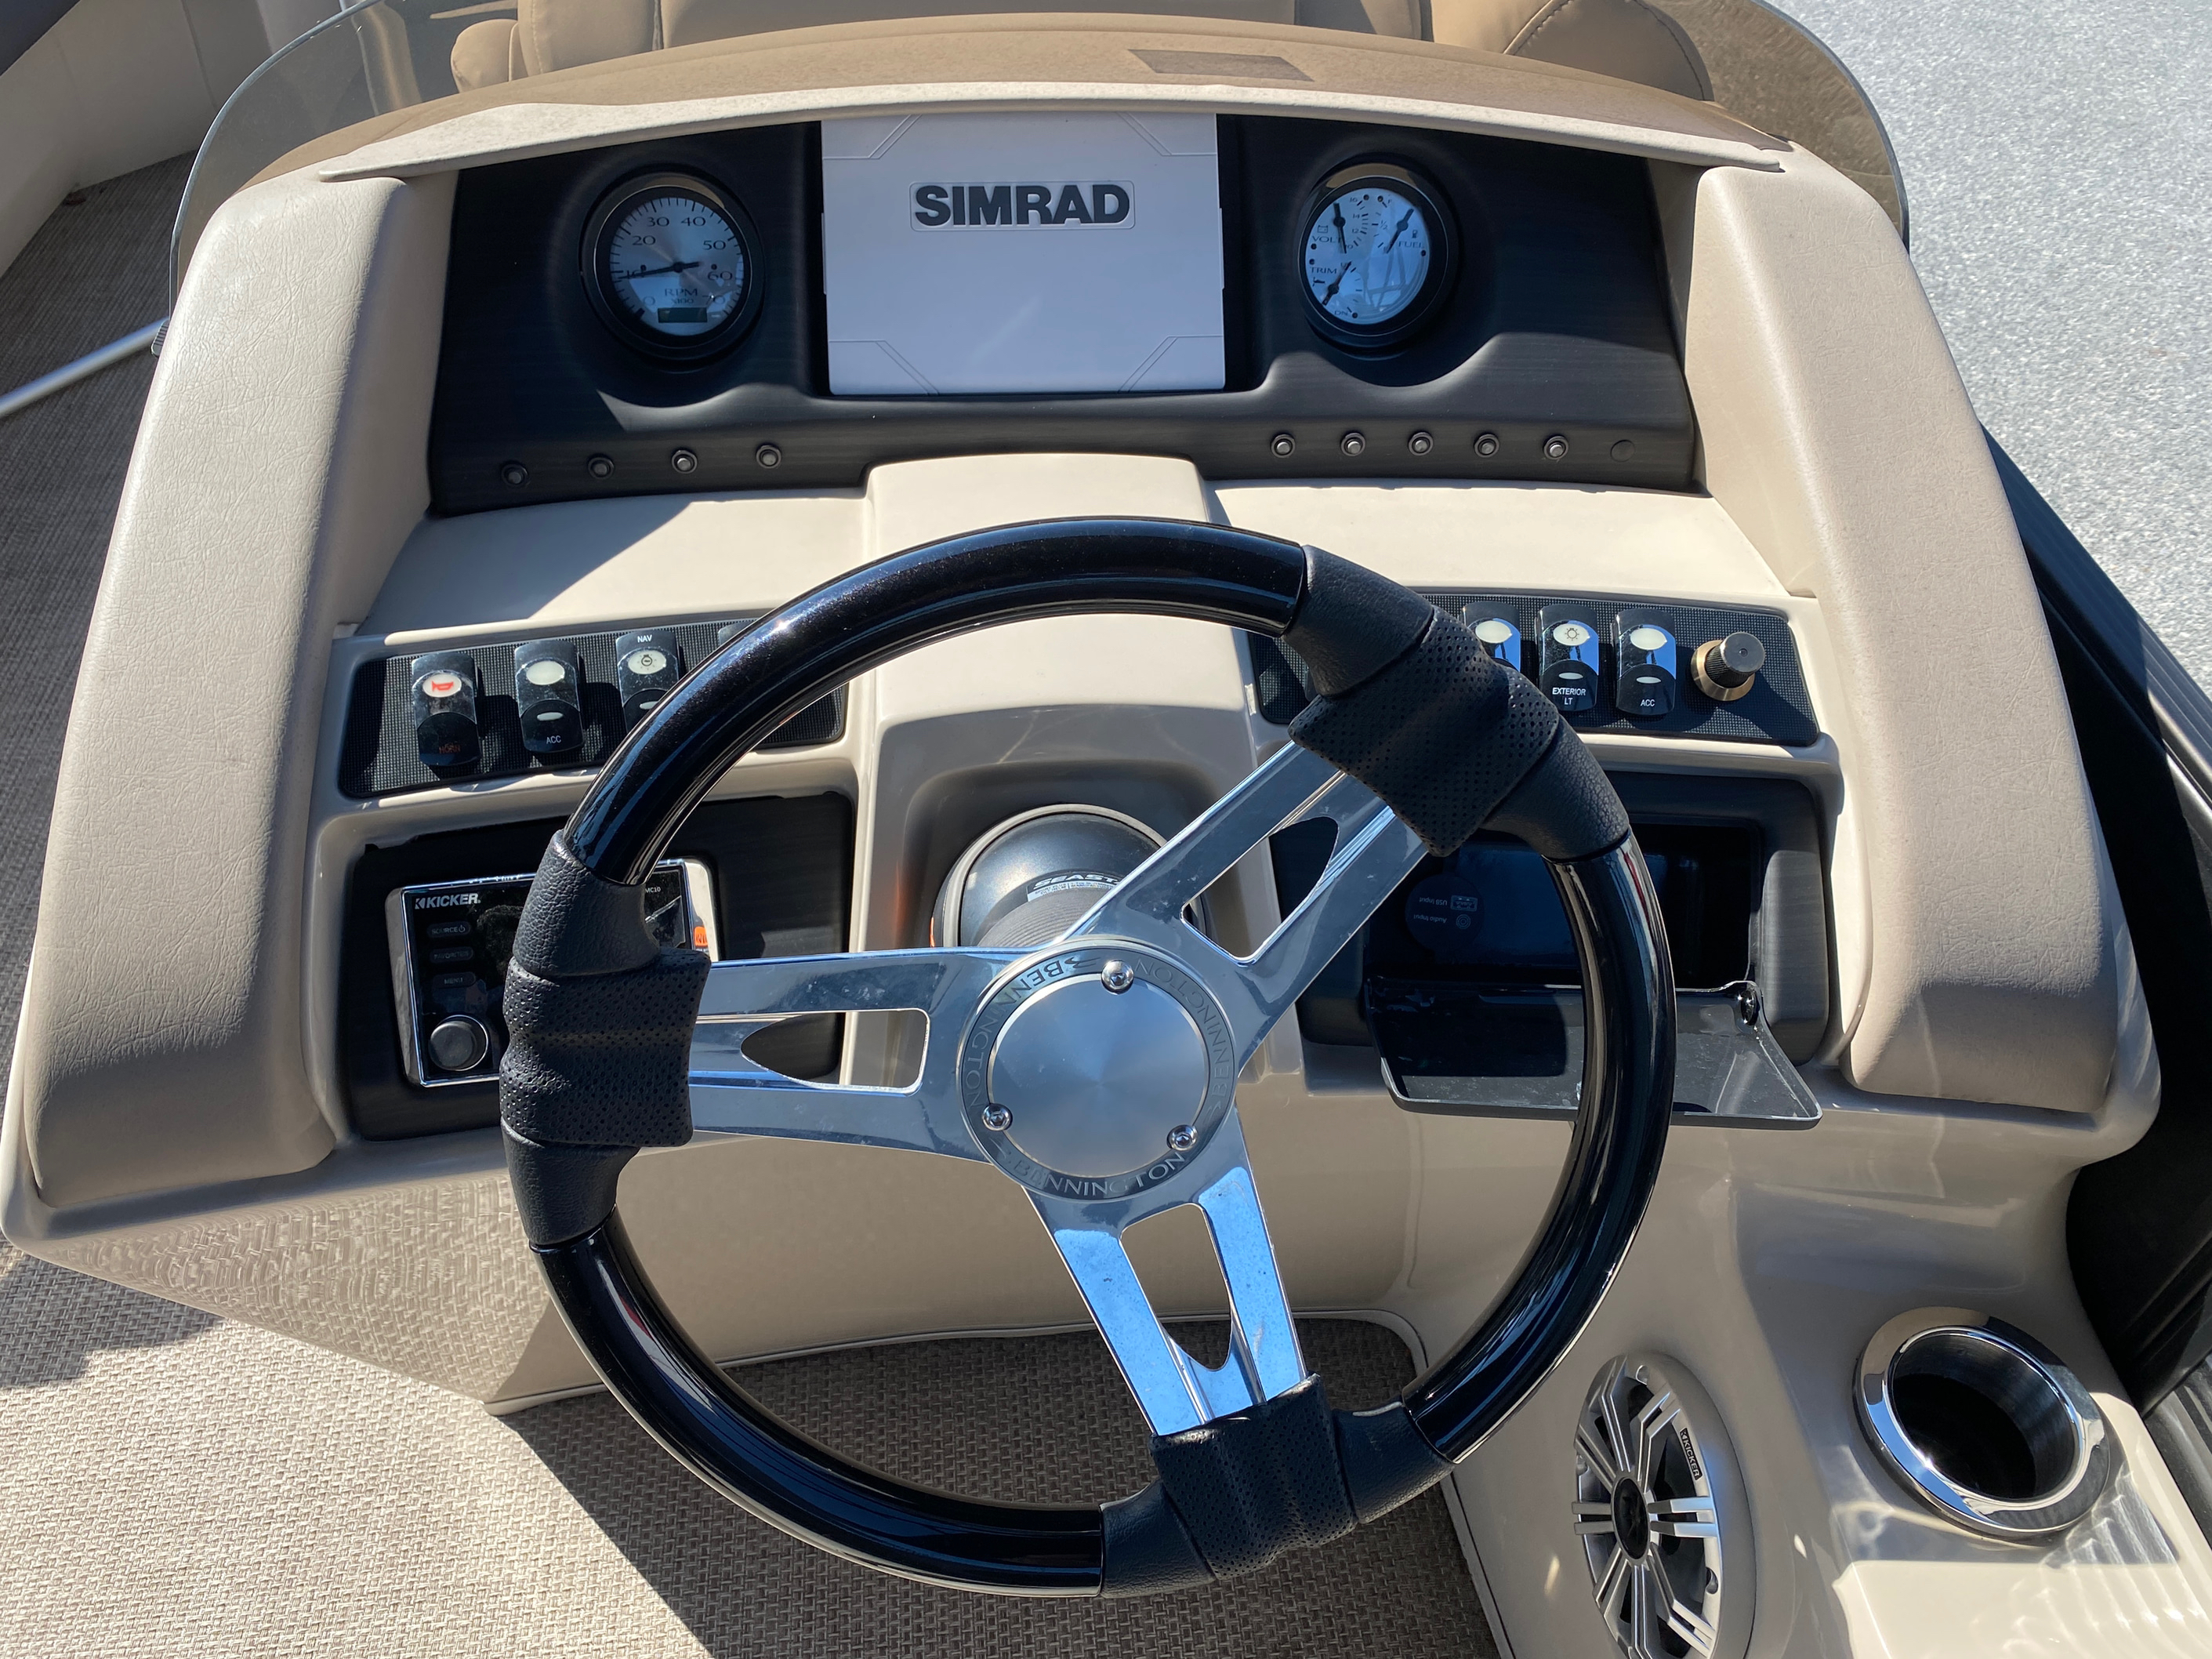 2019 Bennington boat for sale, model of the boat is 23 GSR & Image # 7 of 10